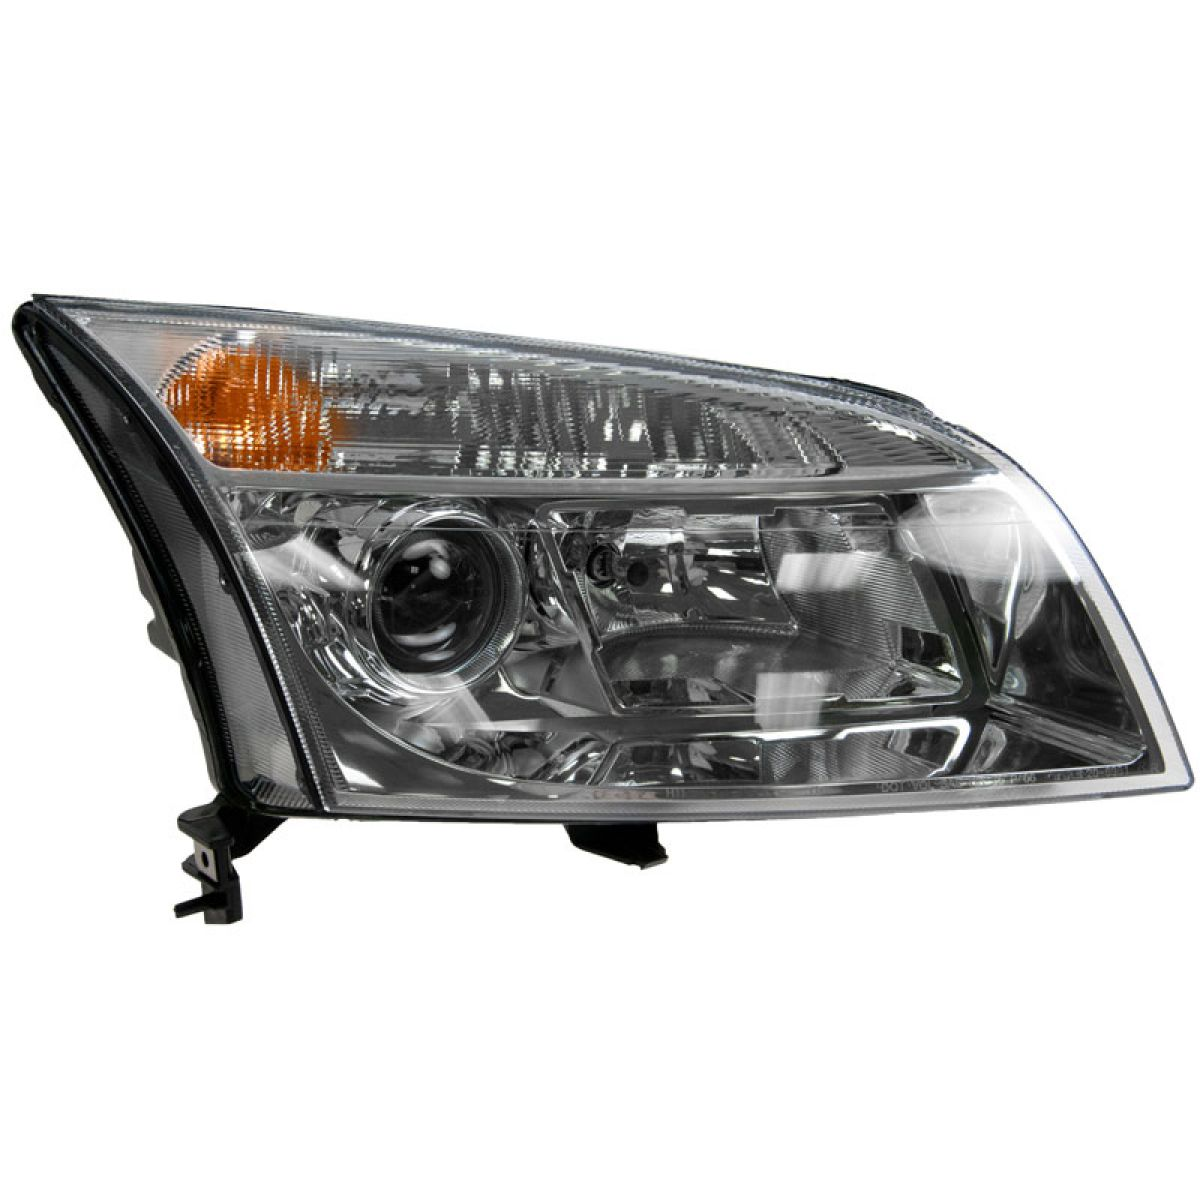 hight resolution of headlight headlamp passenger side right rh new for 06 09 mercury milan